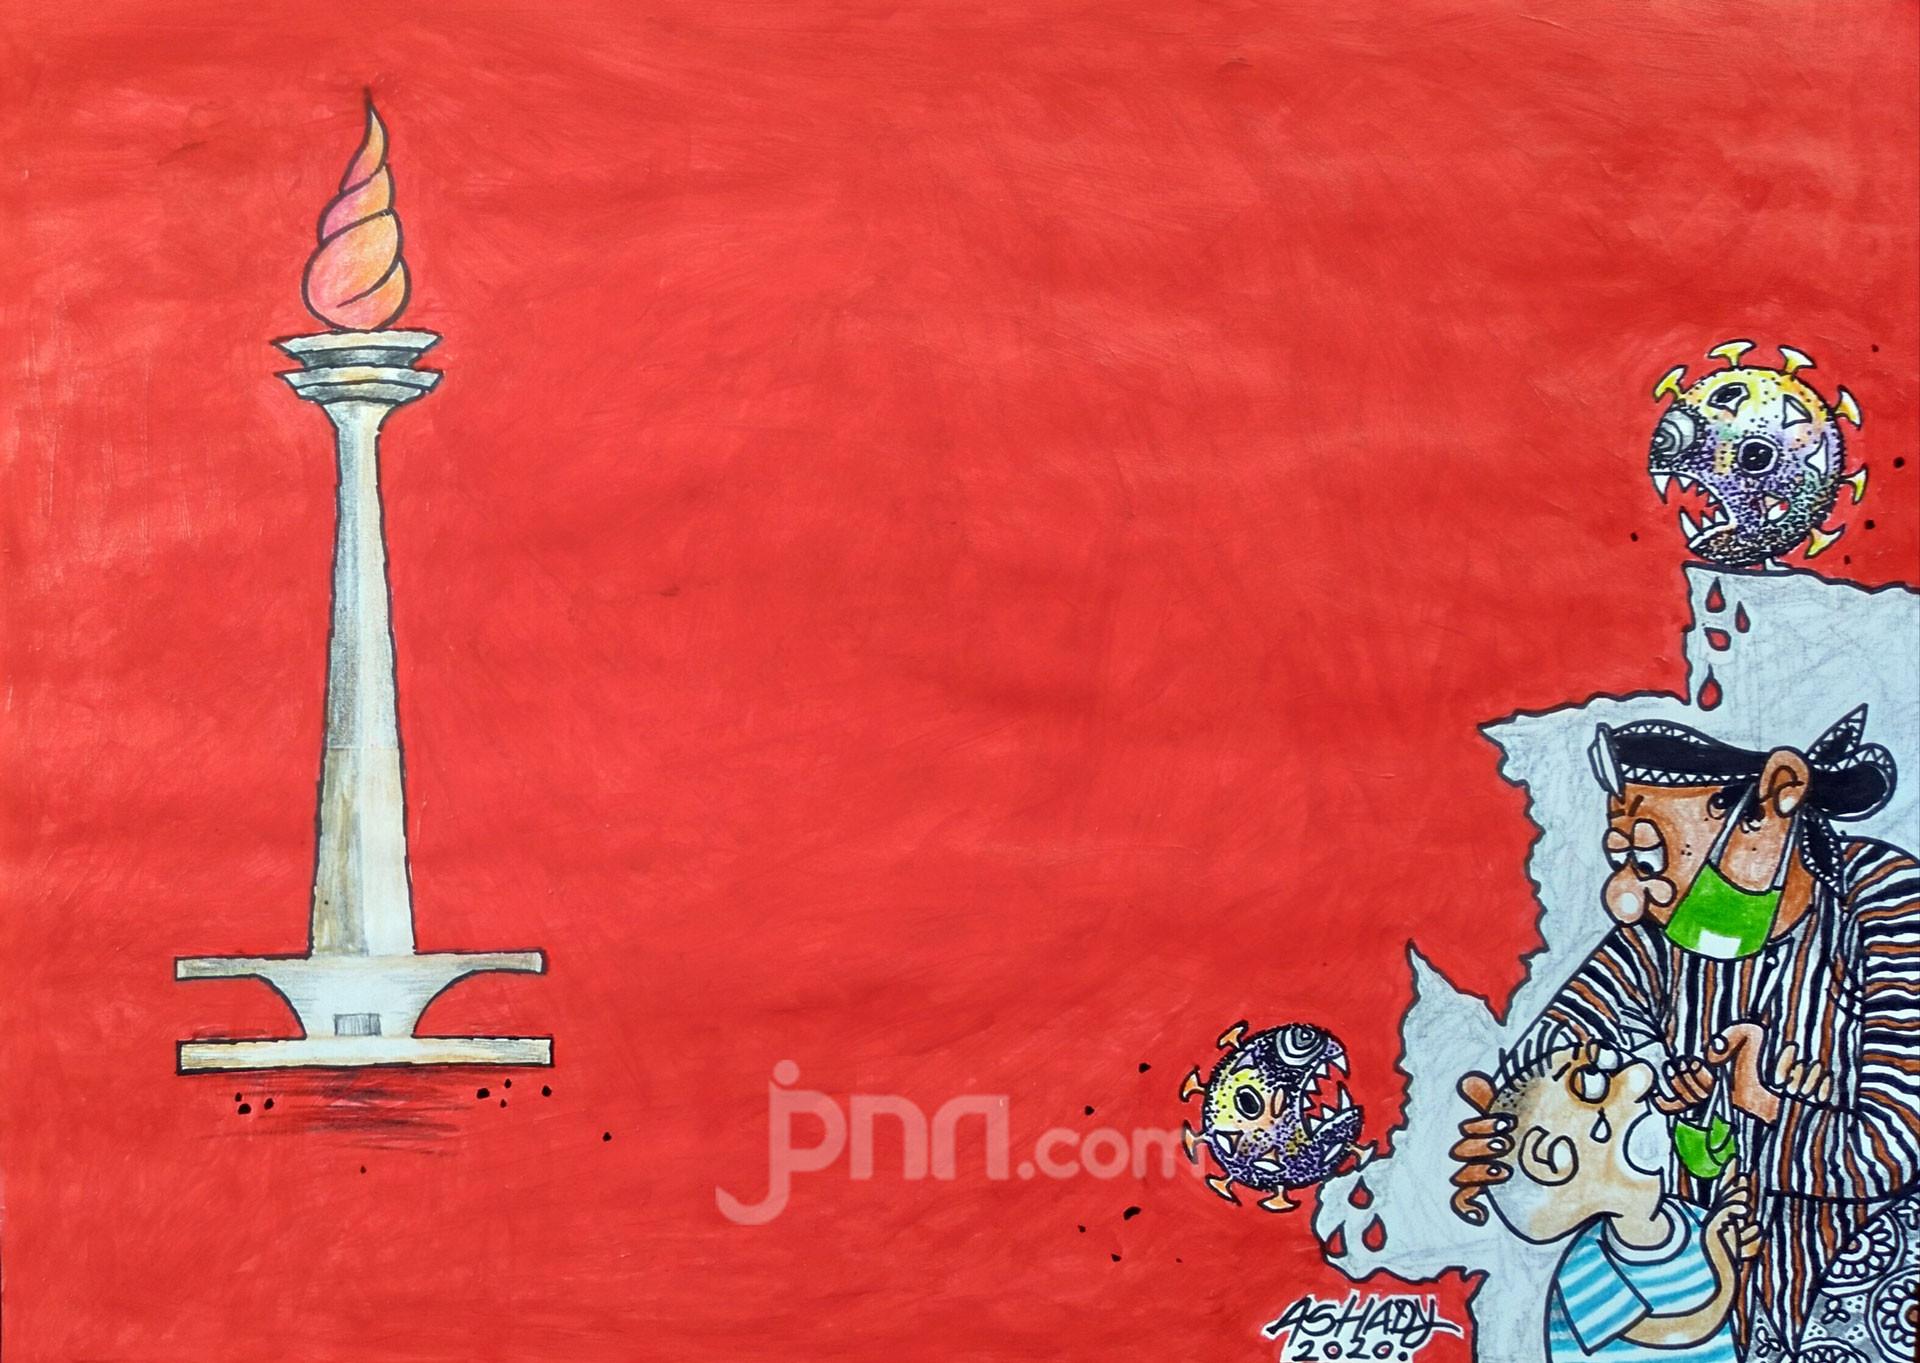 Jakarta Zona Merah Karikatur oleh Ashady - JPNN.com